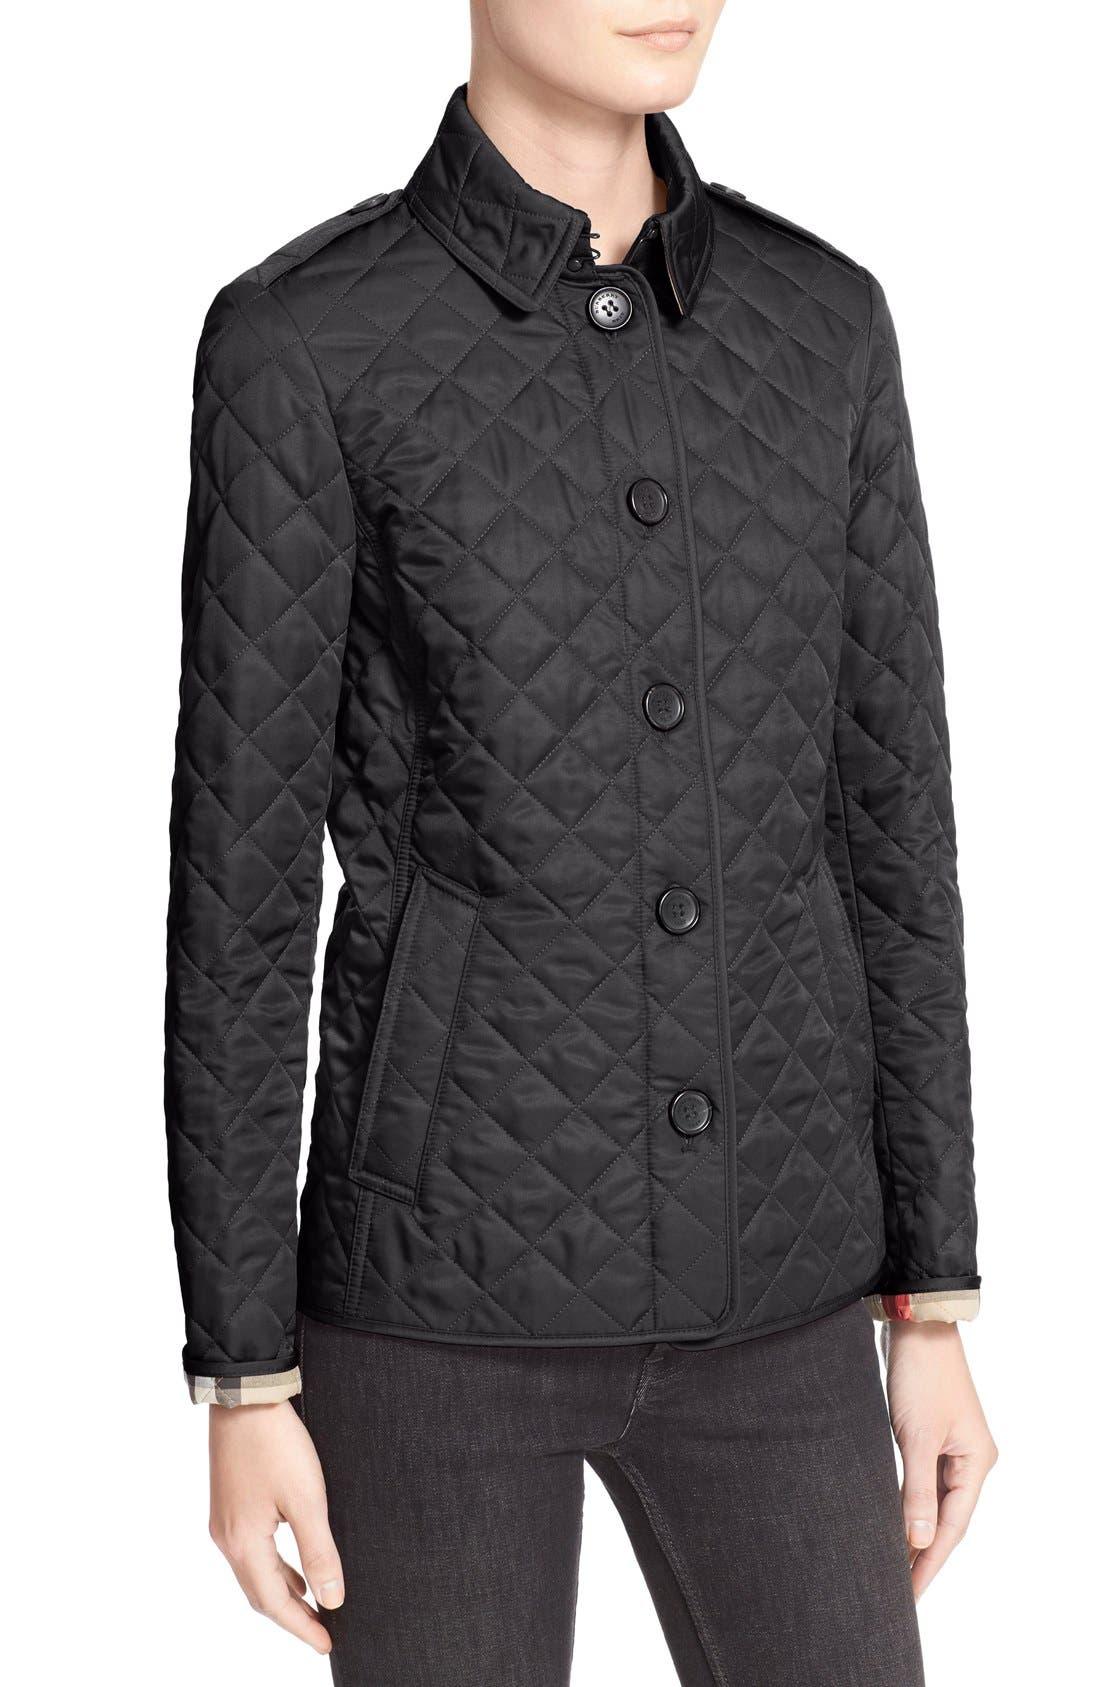 Ashurst Quilted Jacket,                             Alternate thumbnail 7, color,                             BLACK